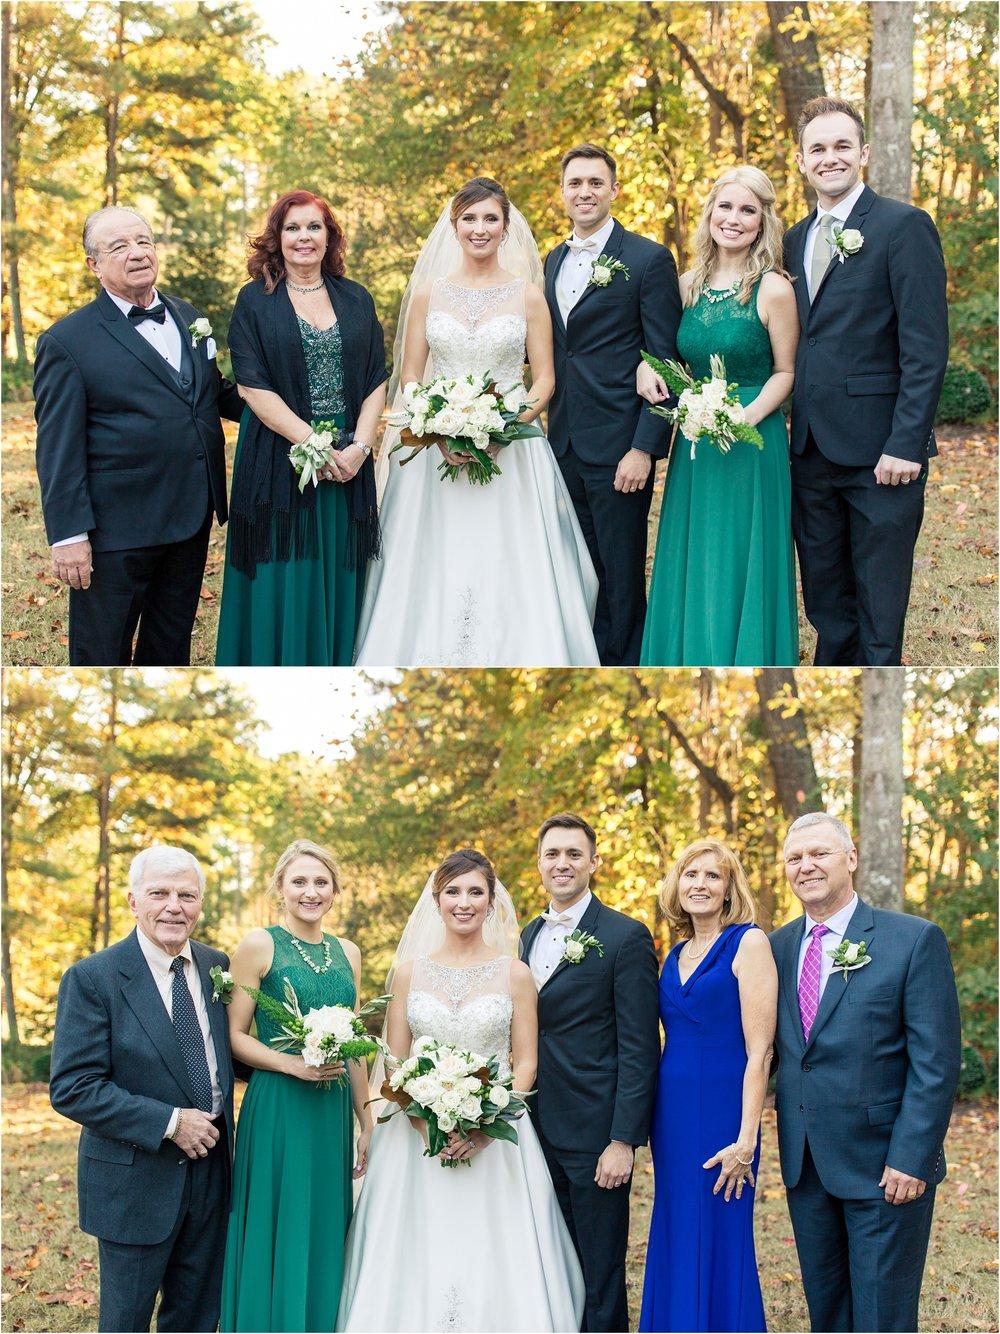 Savannah Eve Photography- Bottiglion-Scope Wedding- Sneak Peek-33.jpg